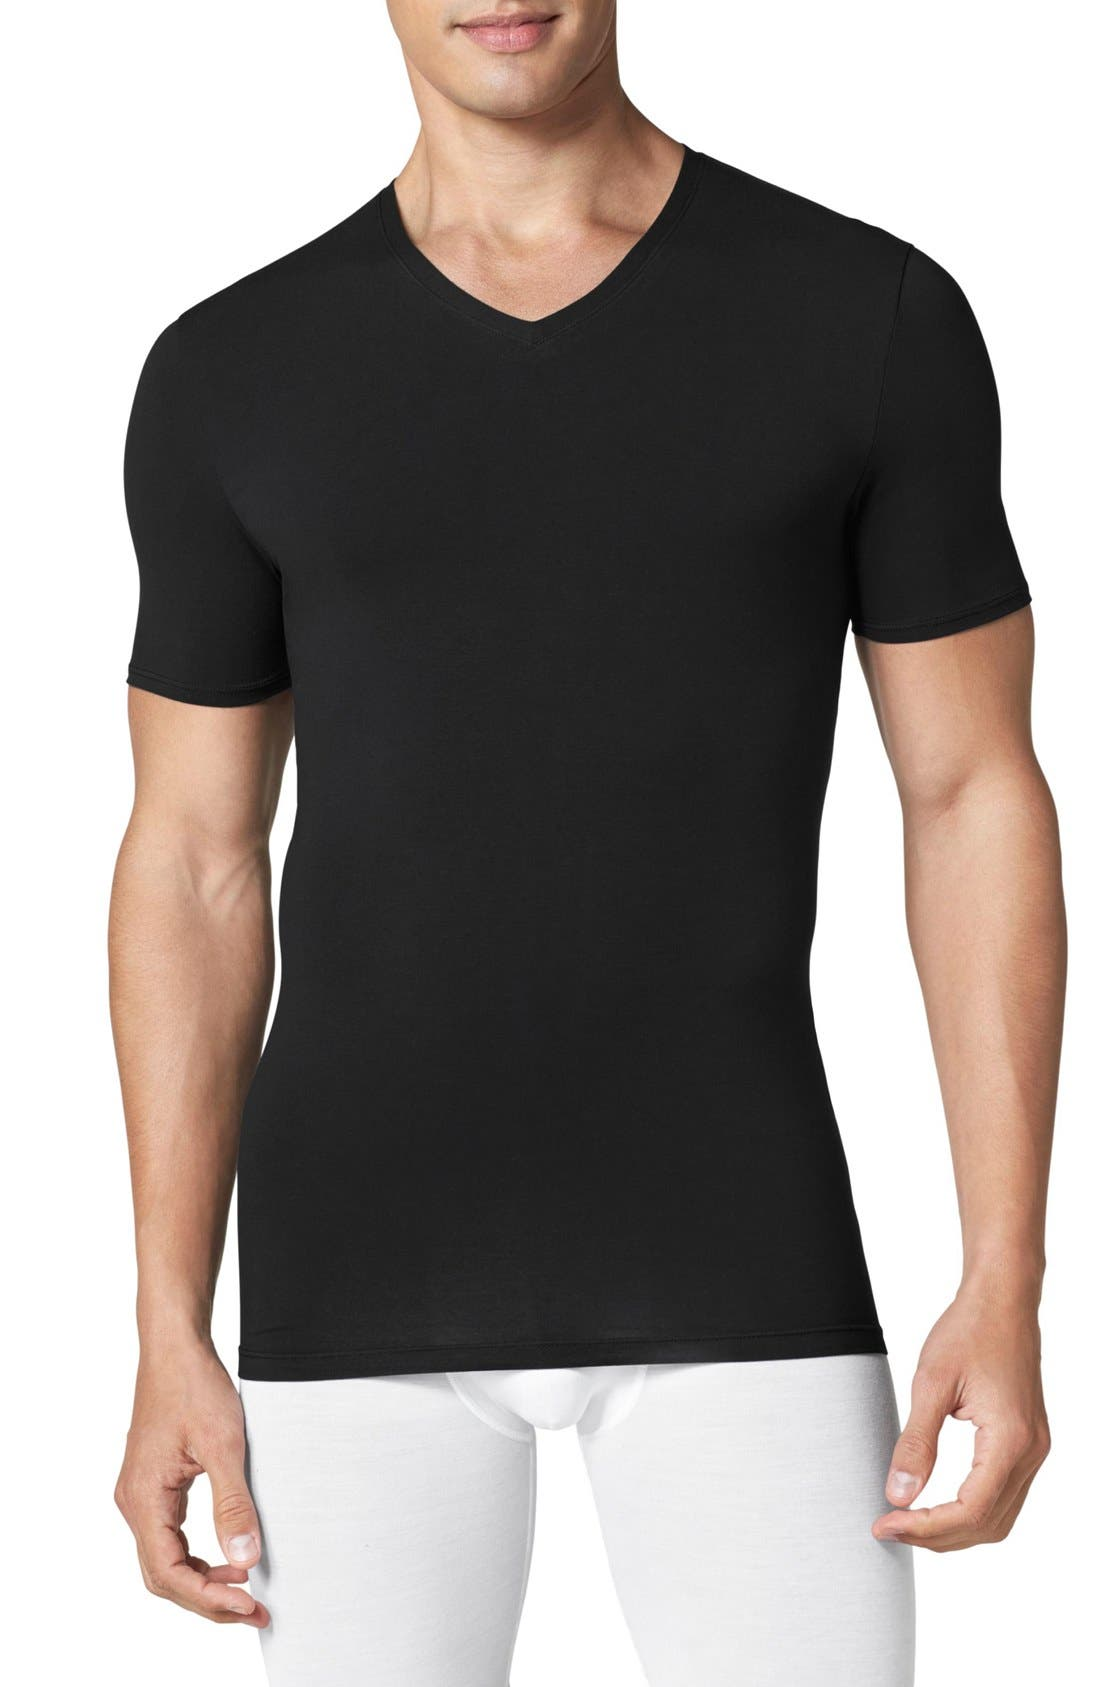 TOMMY JOHN 'Cool Cotton' High V-Neck Undershirt